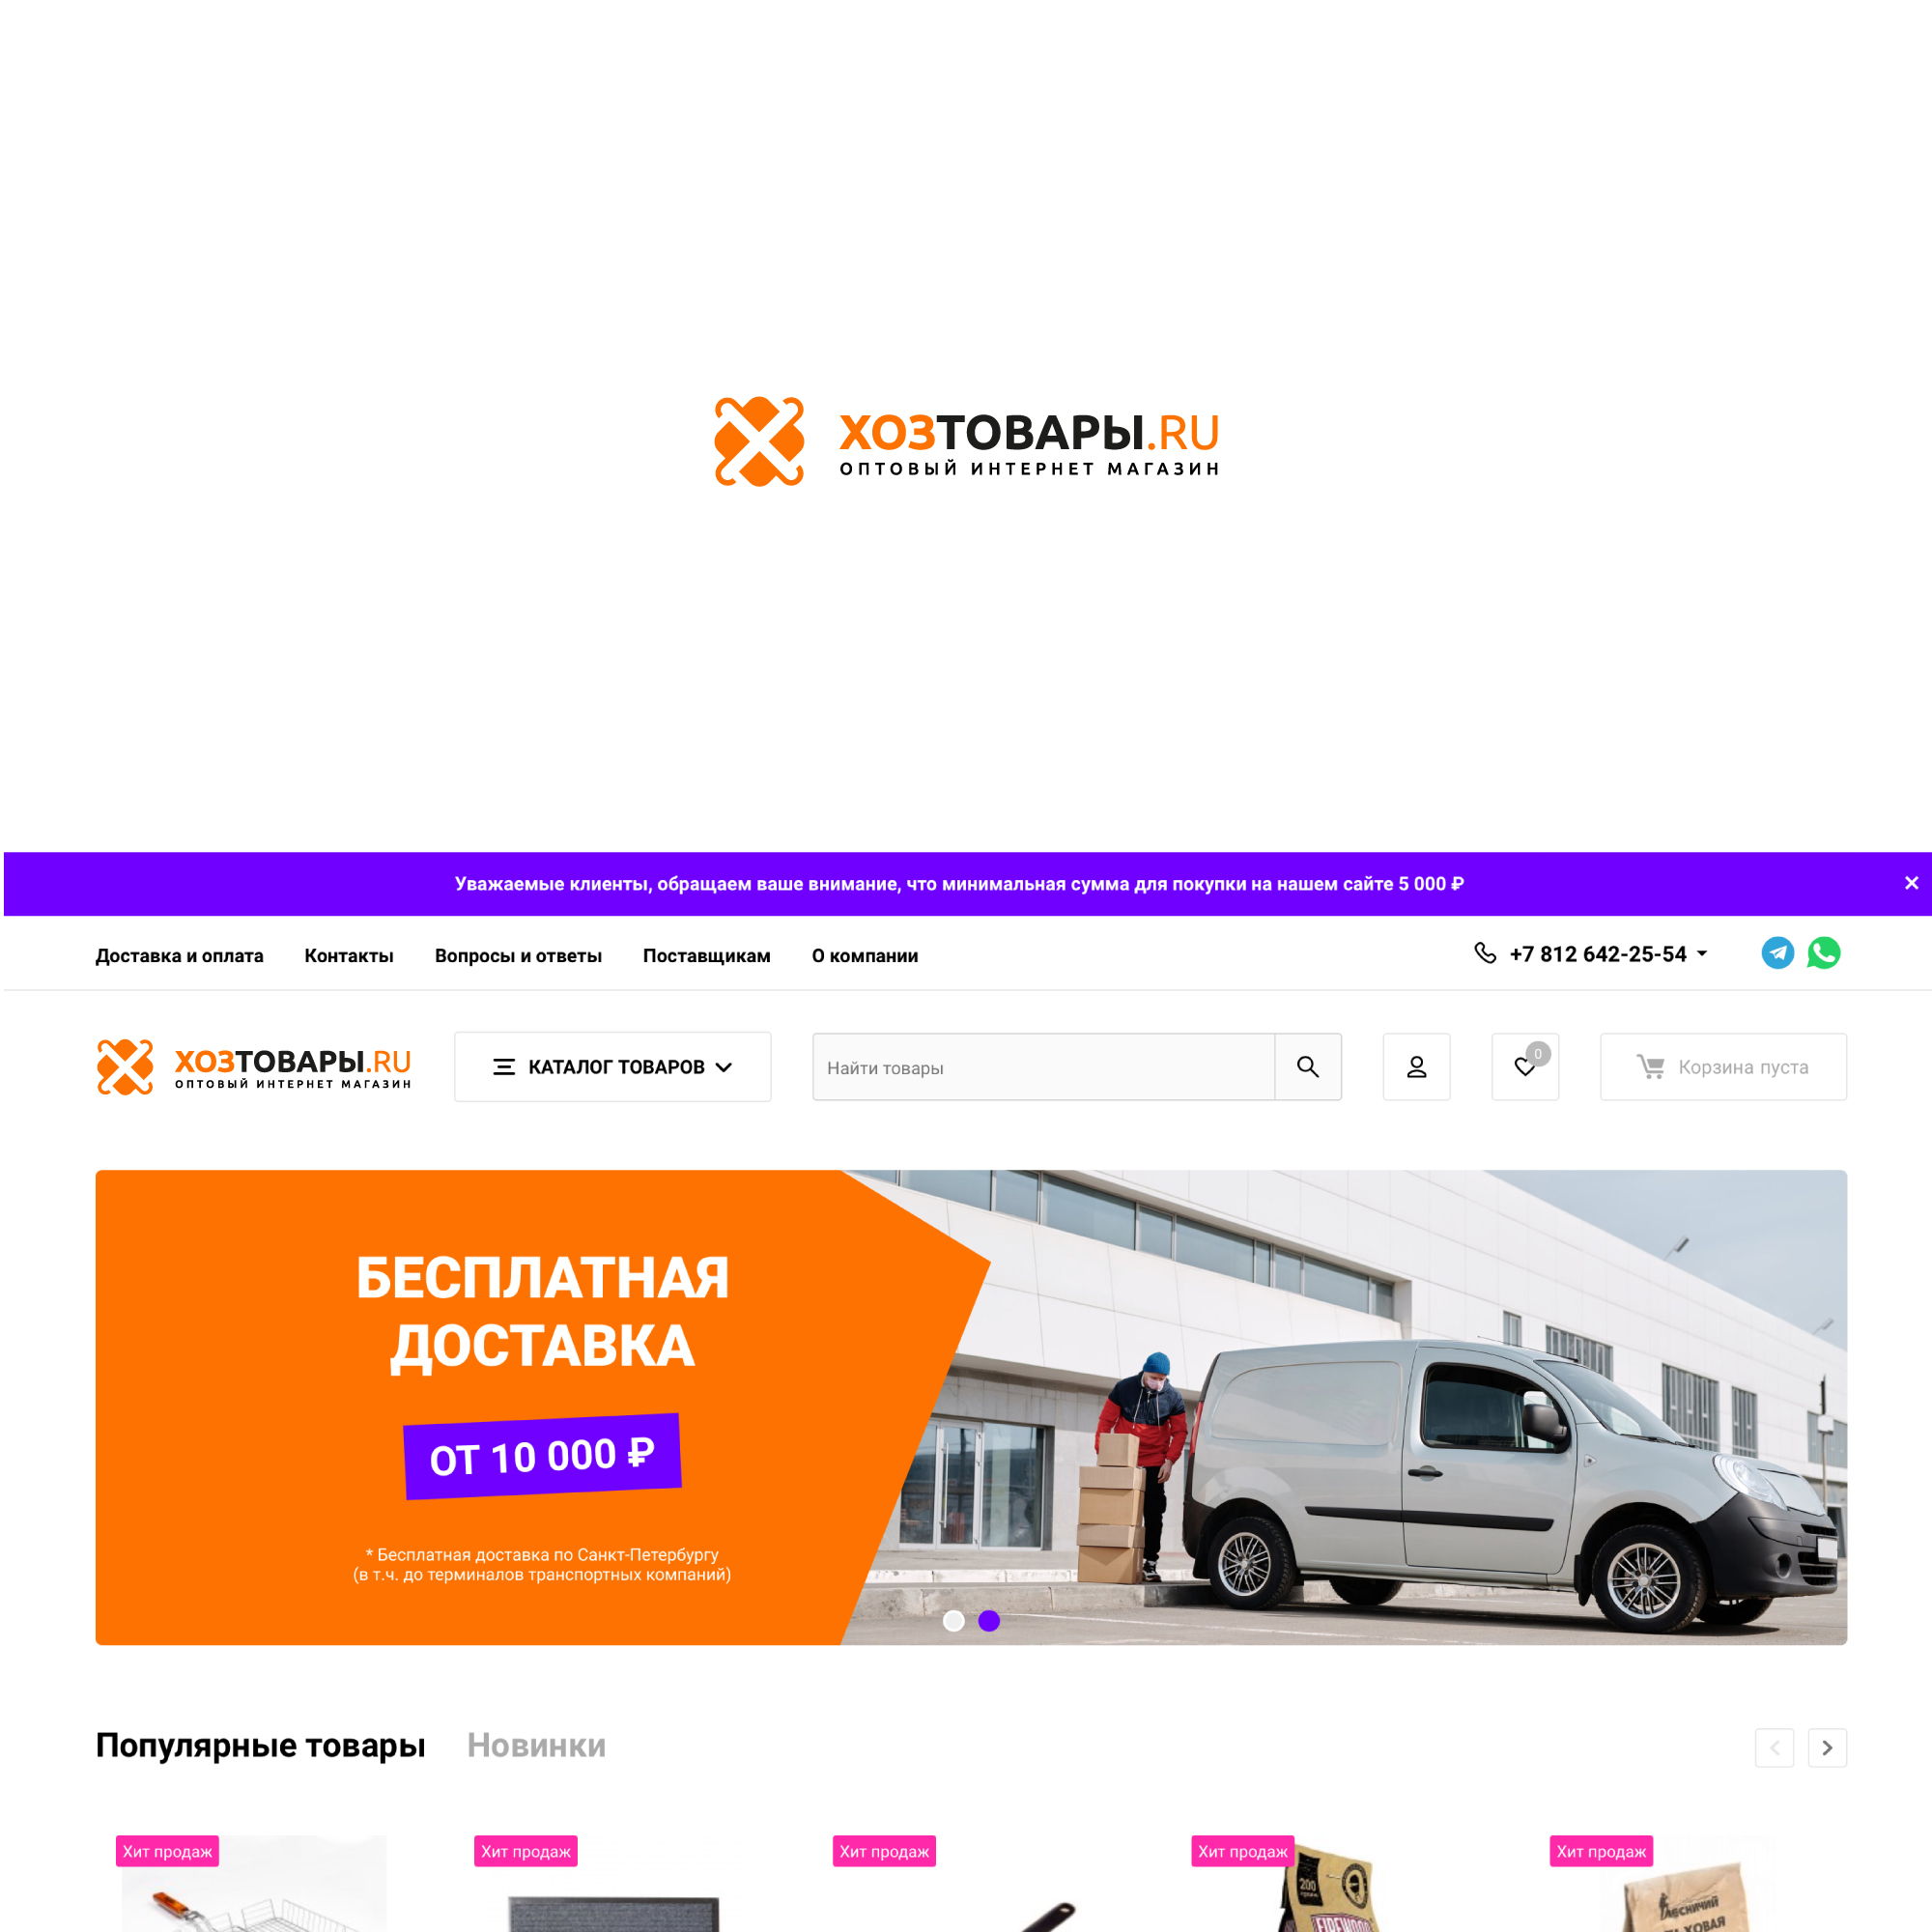 Разработка логотипа для оптового интернет-магазина «Хозтовары.ру» фото f_3596083f4638045c.jpg